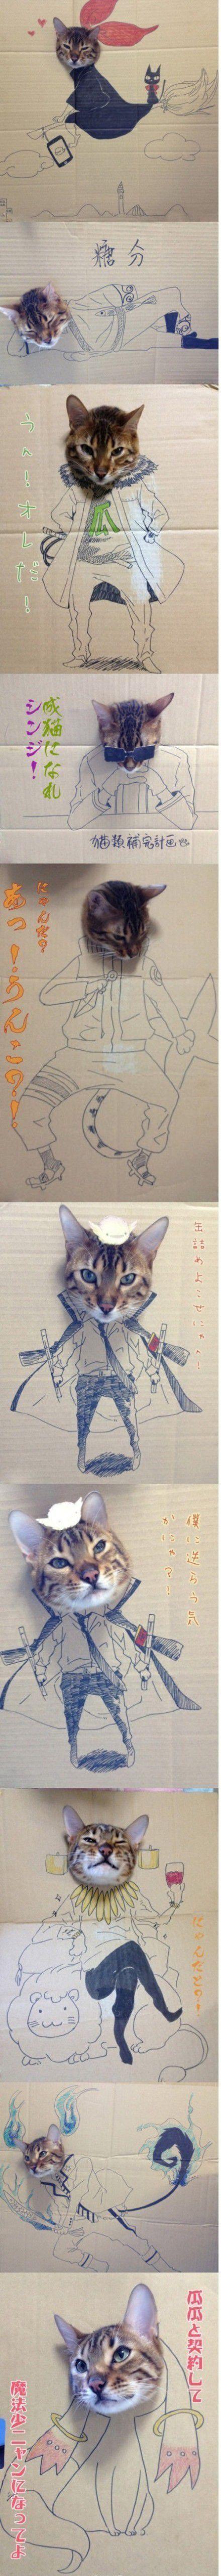 : Cat Adventures, Cats, Animals, Idea, Funny Cat, Pet, Awesome Cat, Funnies